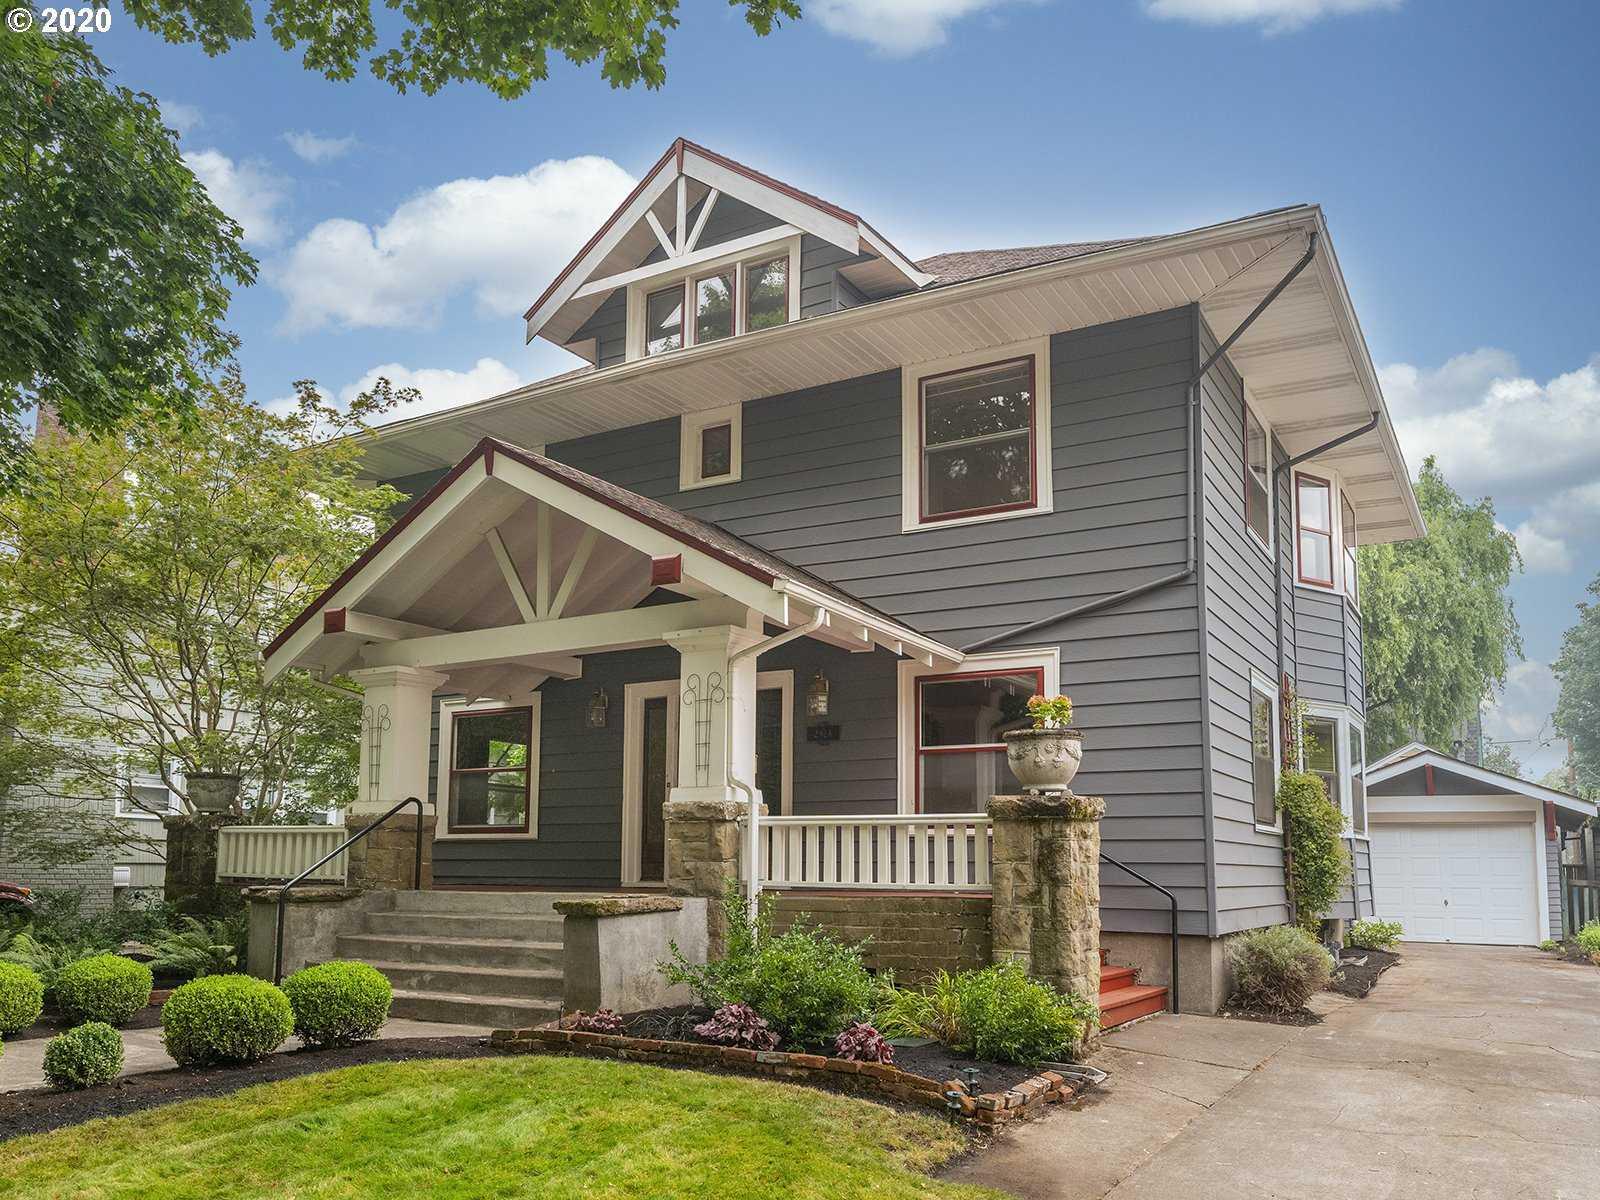 $859,000 - 4Br/3Ba - for Sale in Irvington, Portland